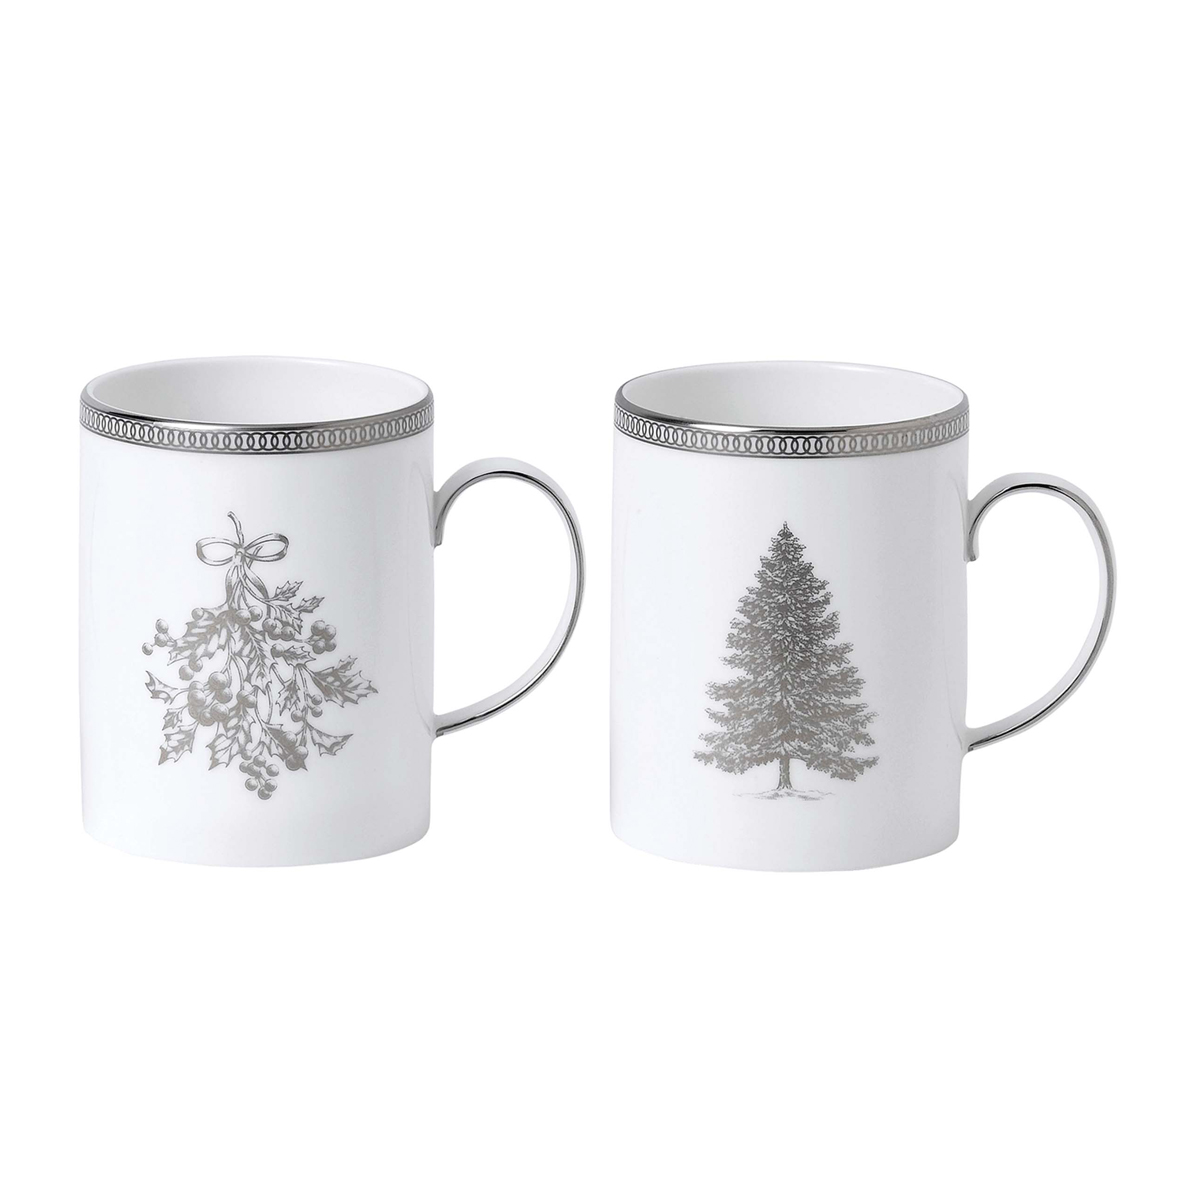 Wedgwood 2021 Winter White Mug Pair